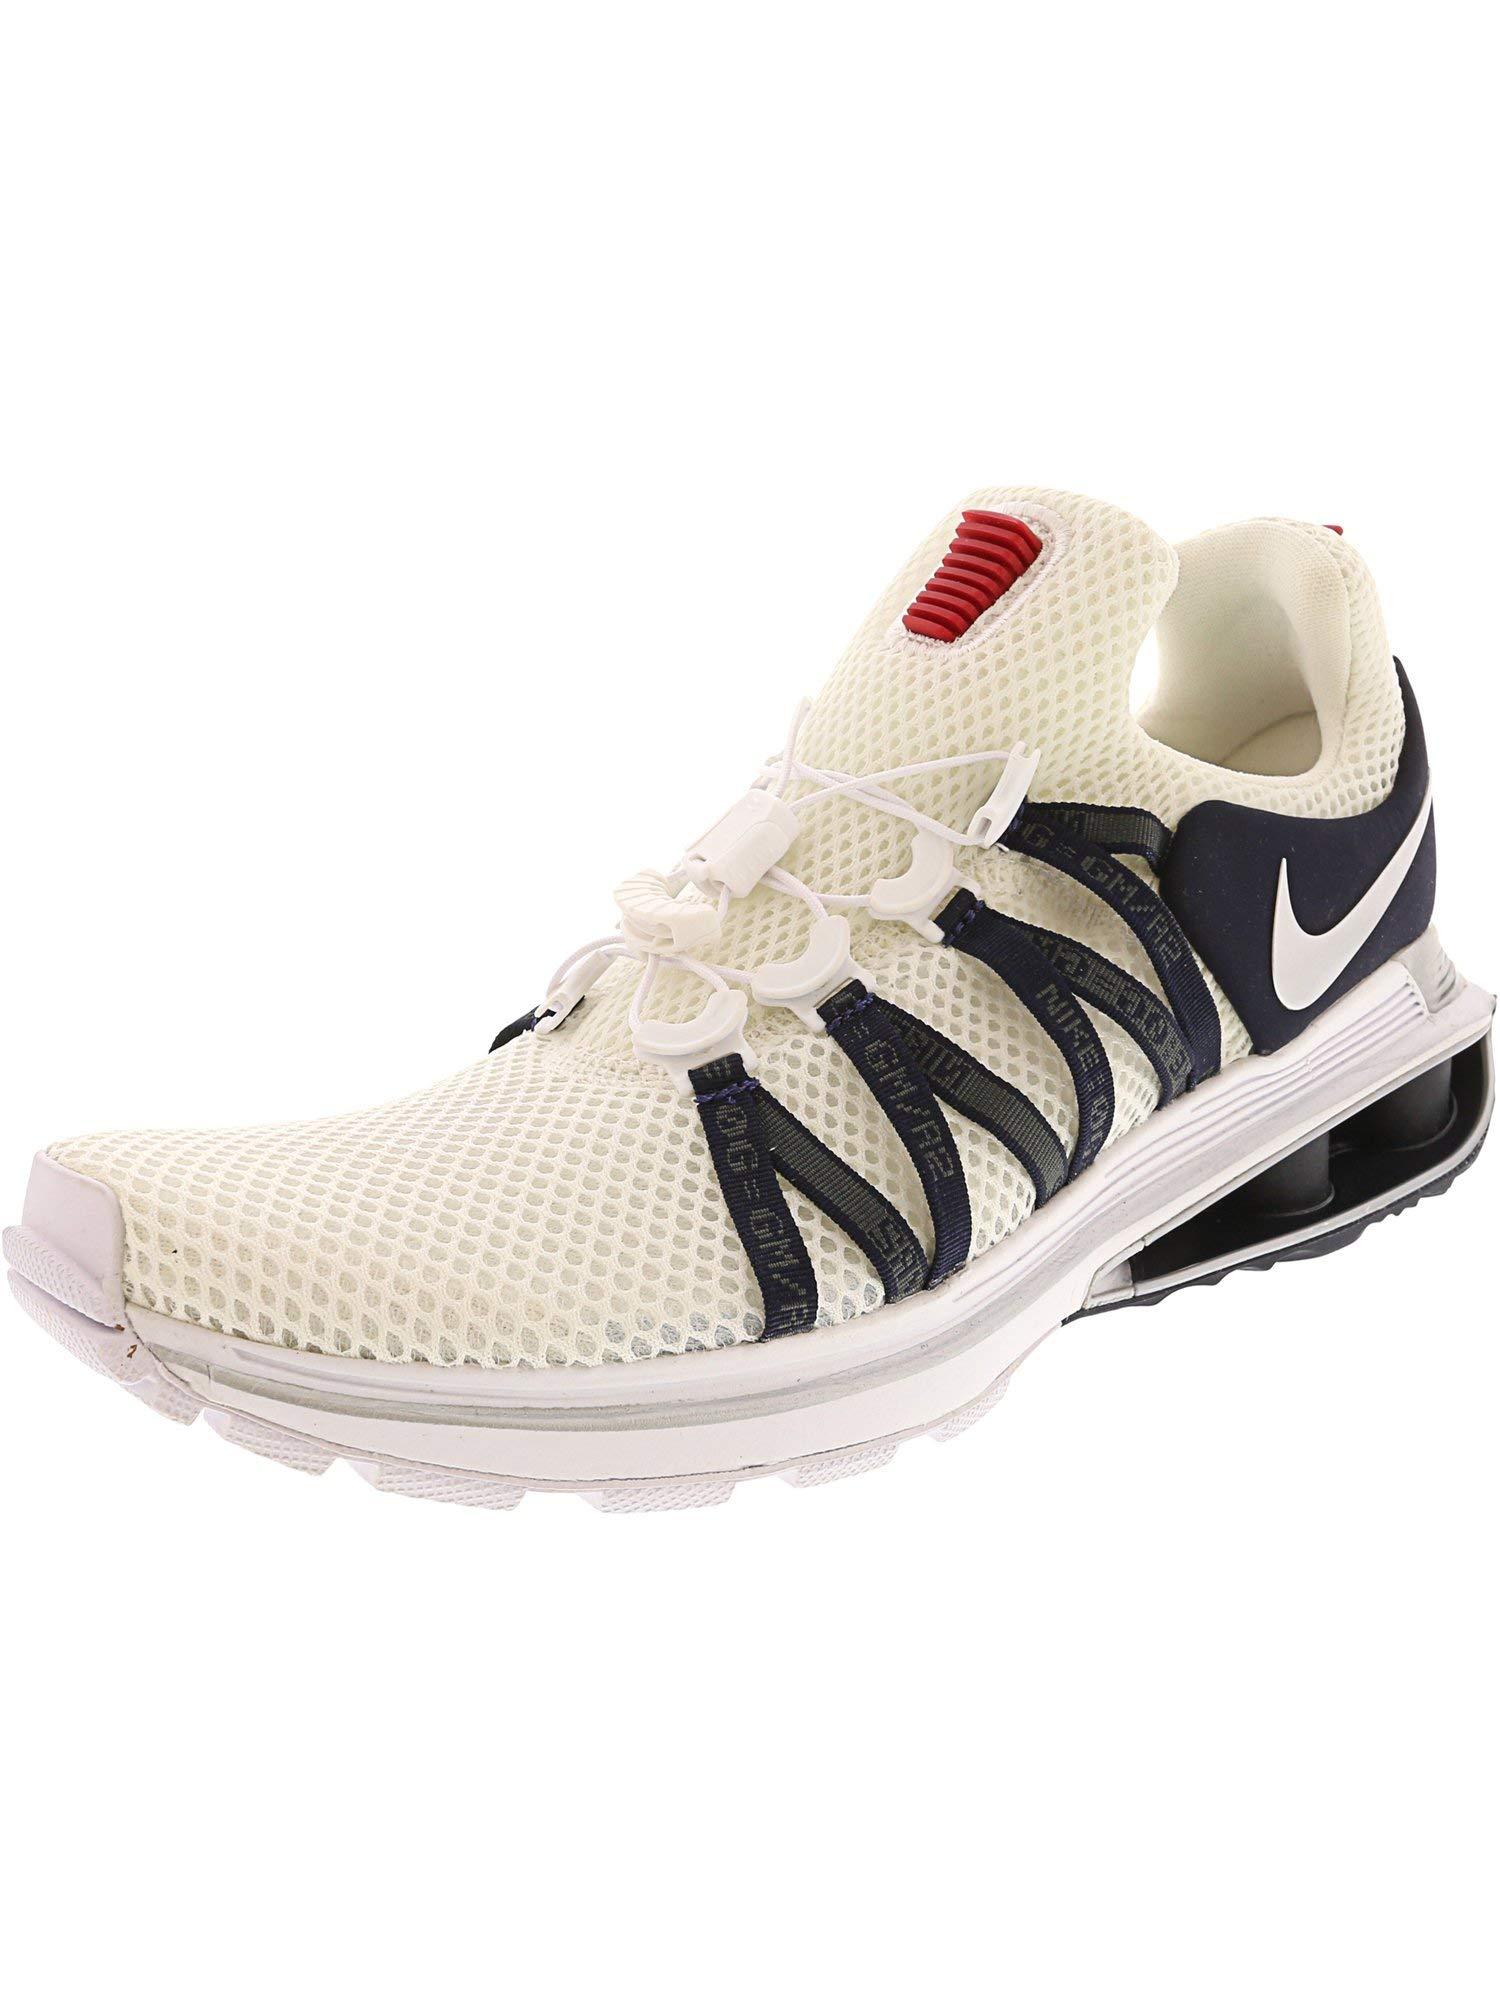 1dc50e47307 Galleon - Nike Shox Gravity Mens Running Shoes Ar1999-104 10 M ...